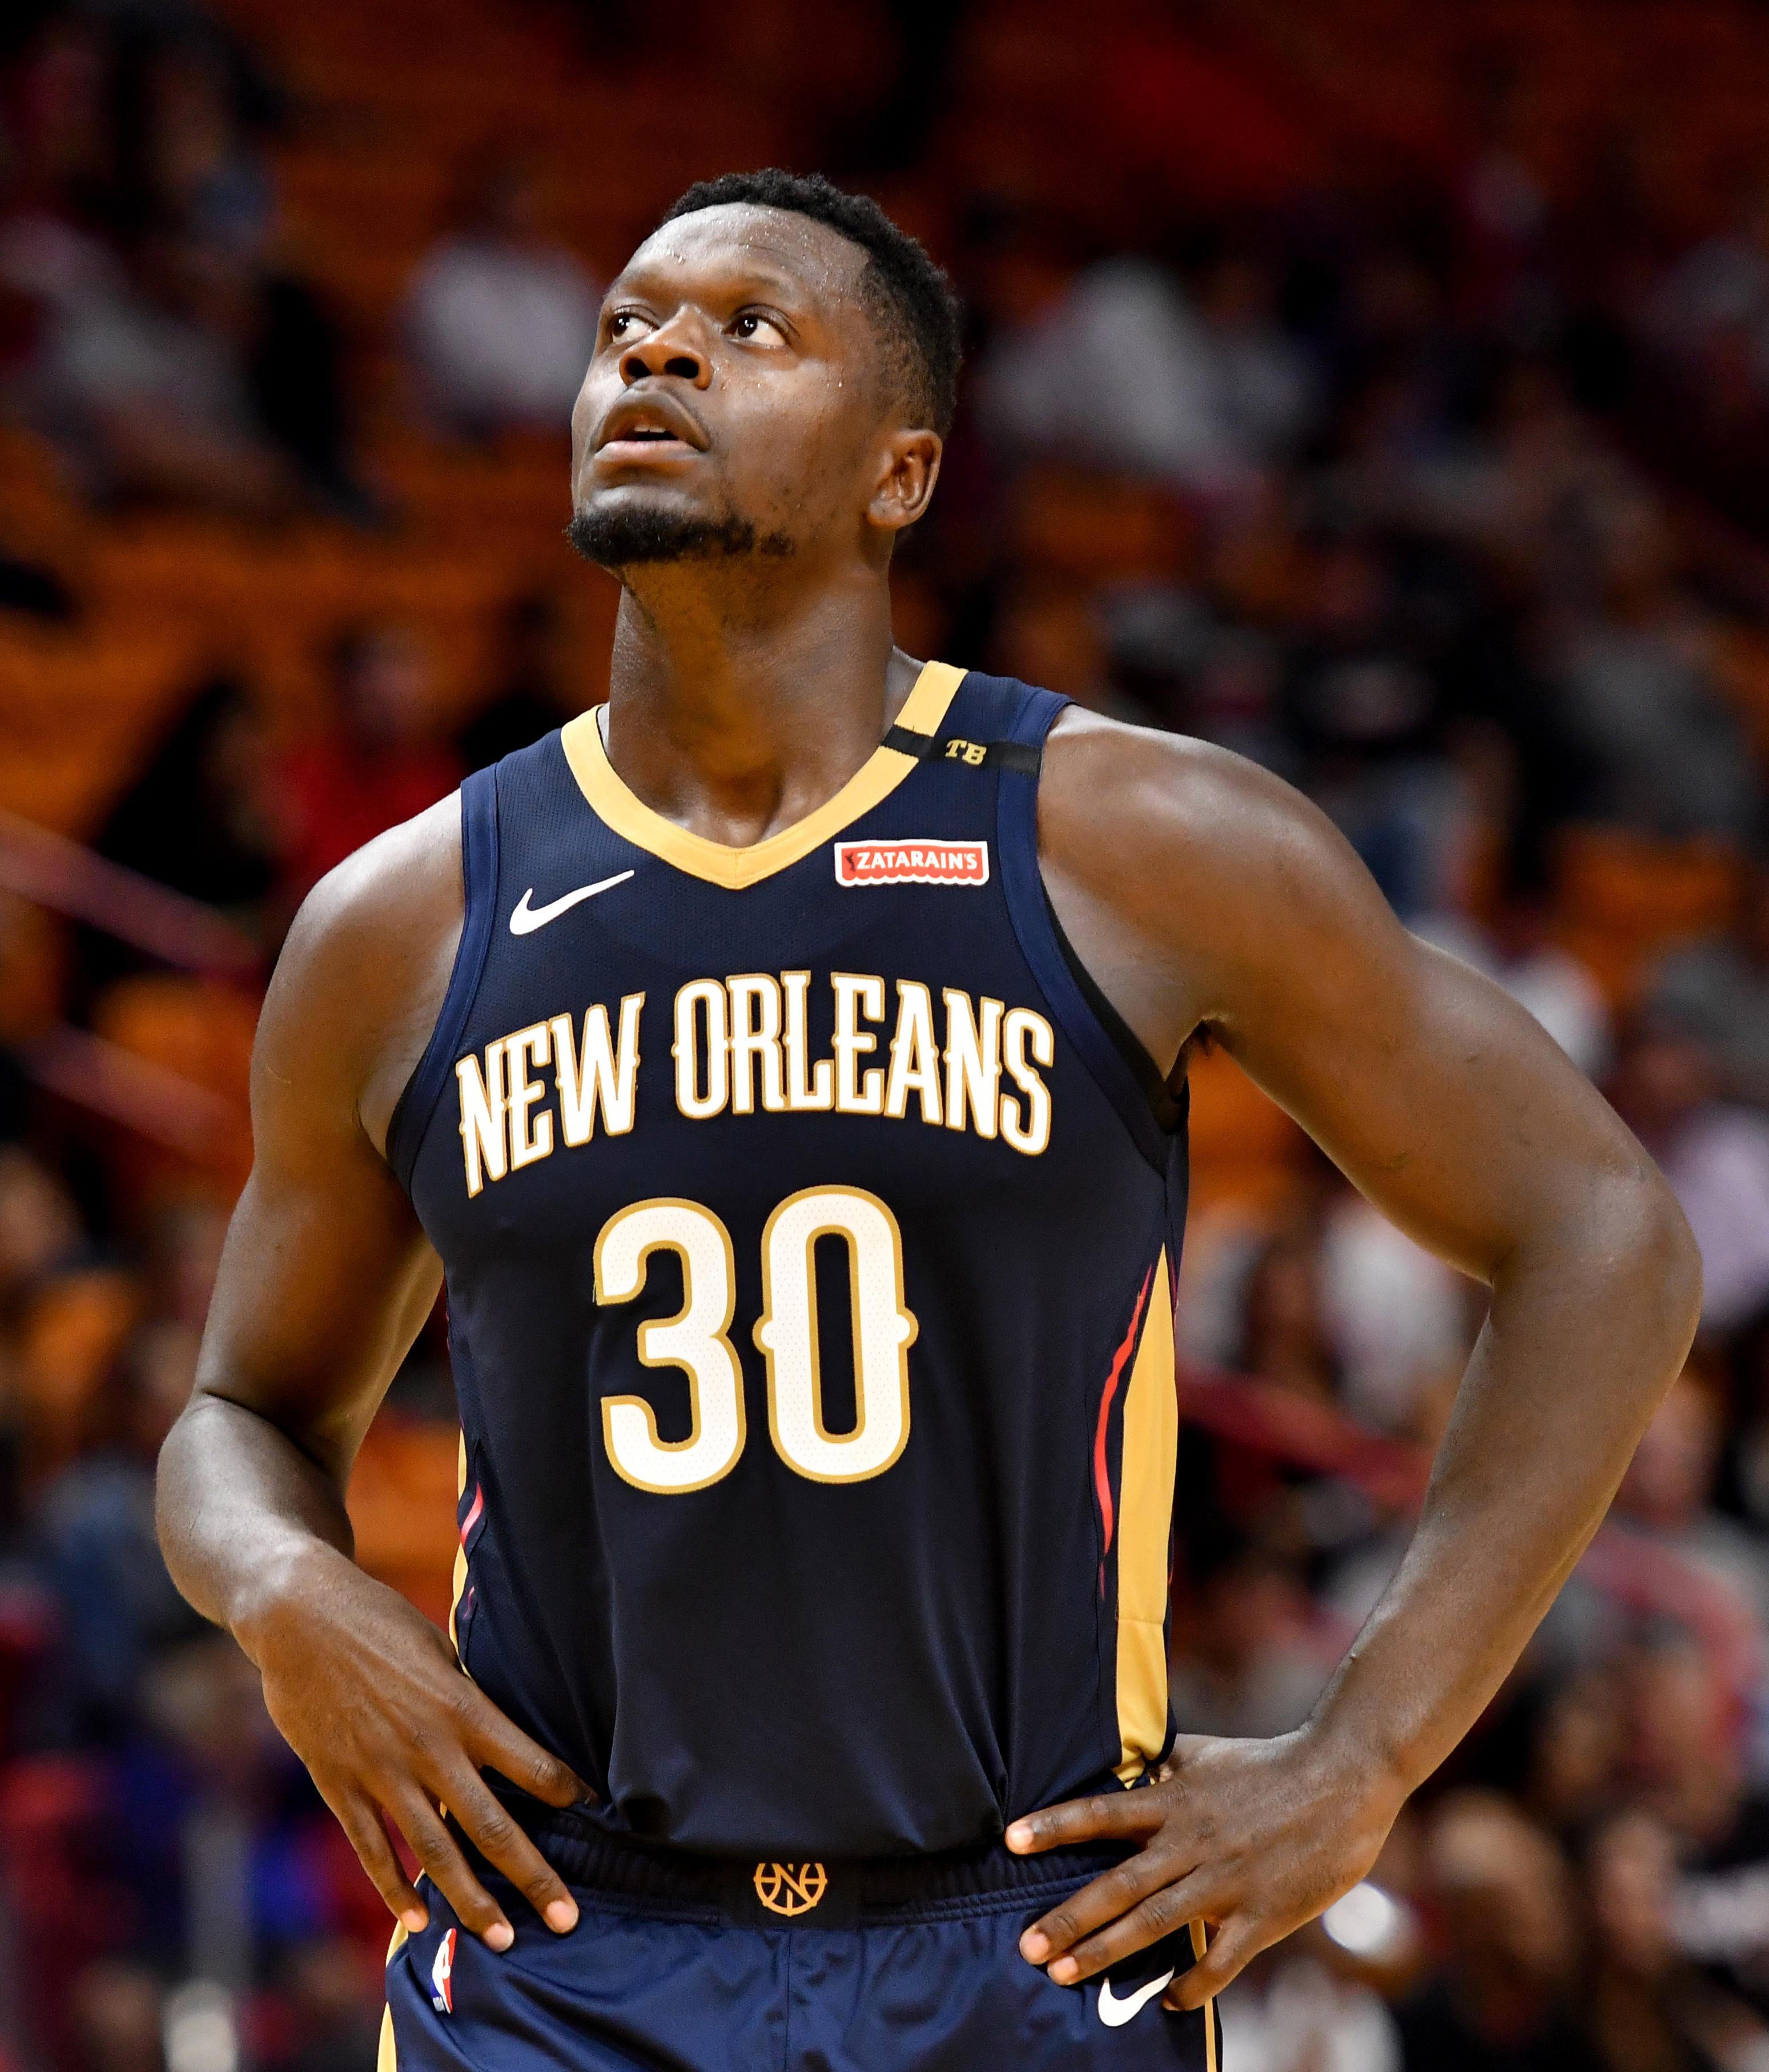 NBA: Preseason-New Orleans Pelicans at Miami Heat